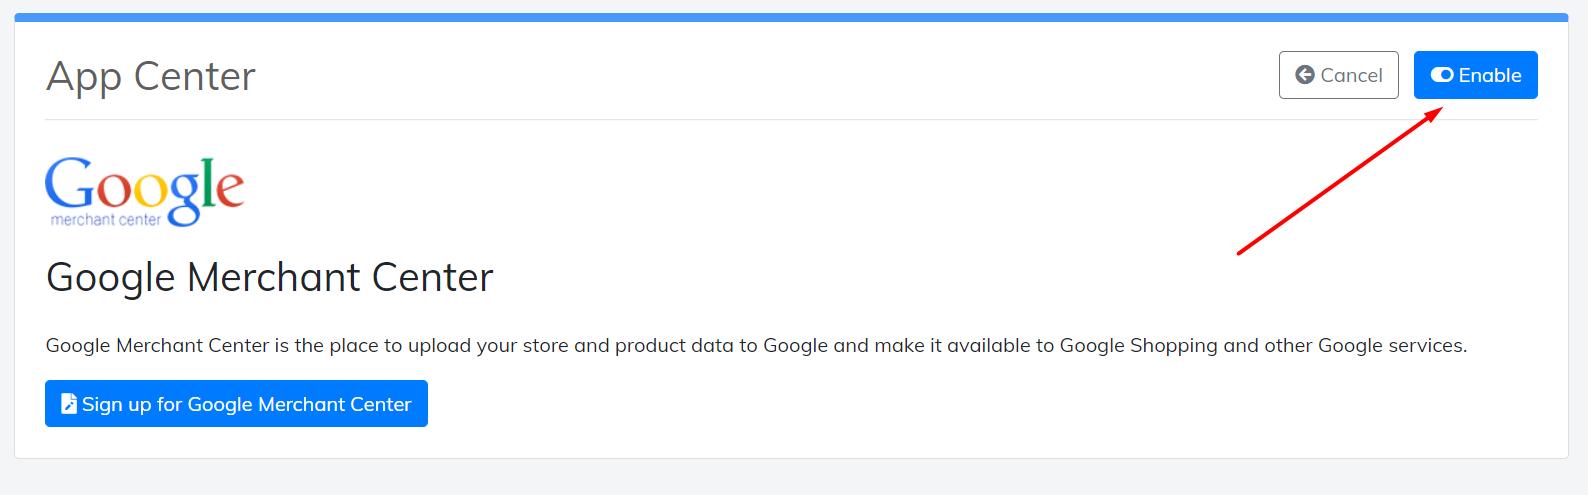 enable google merchant center